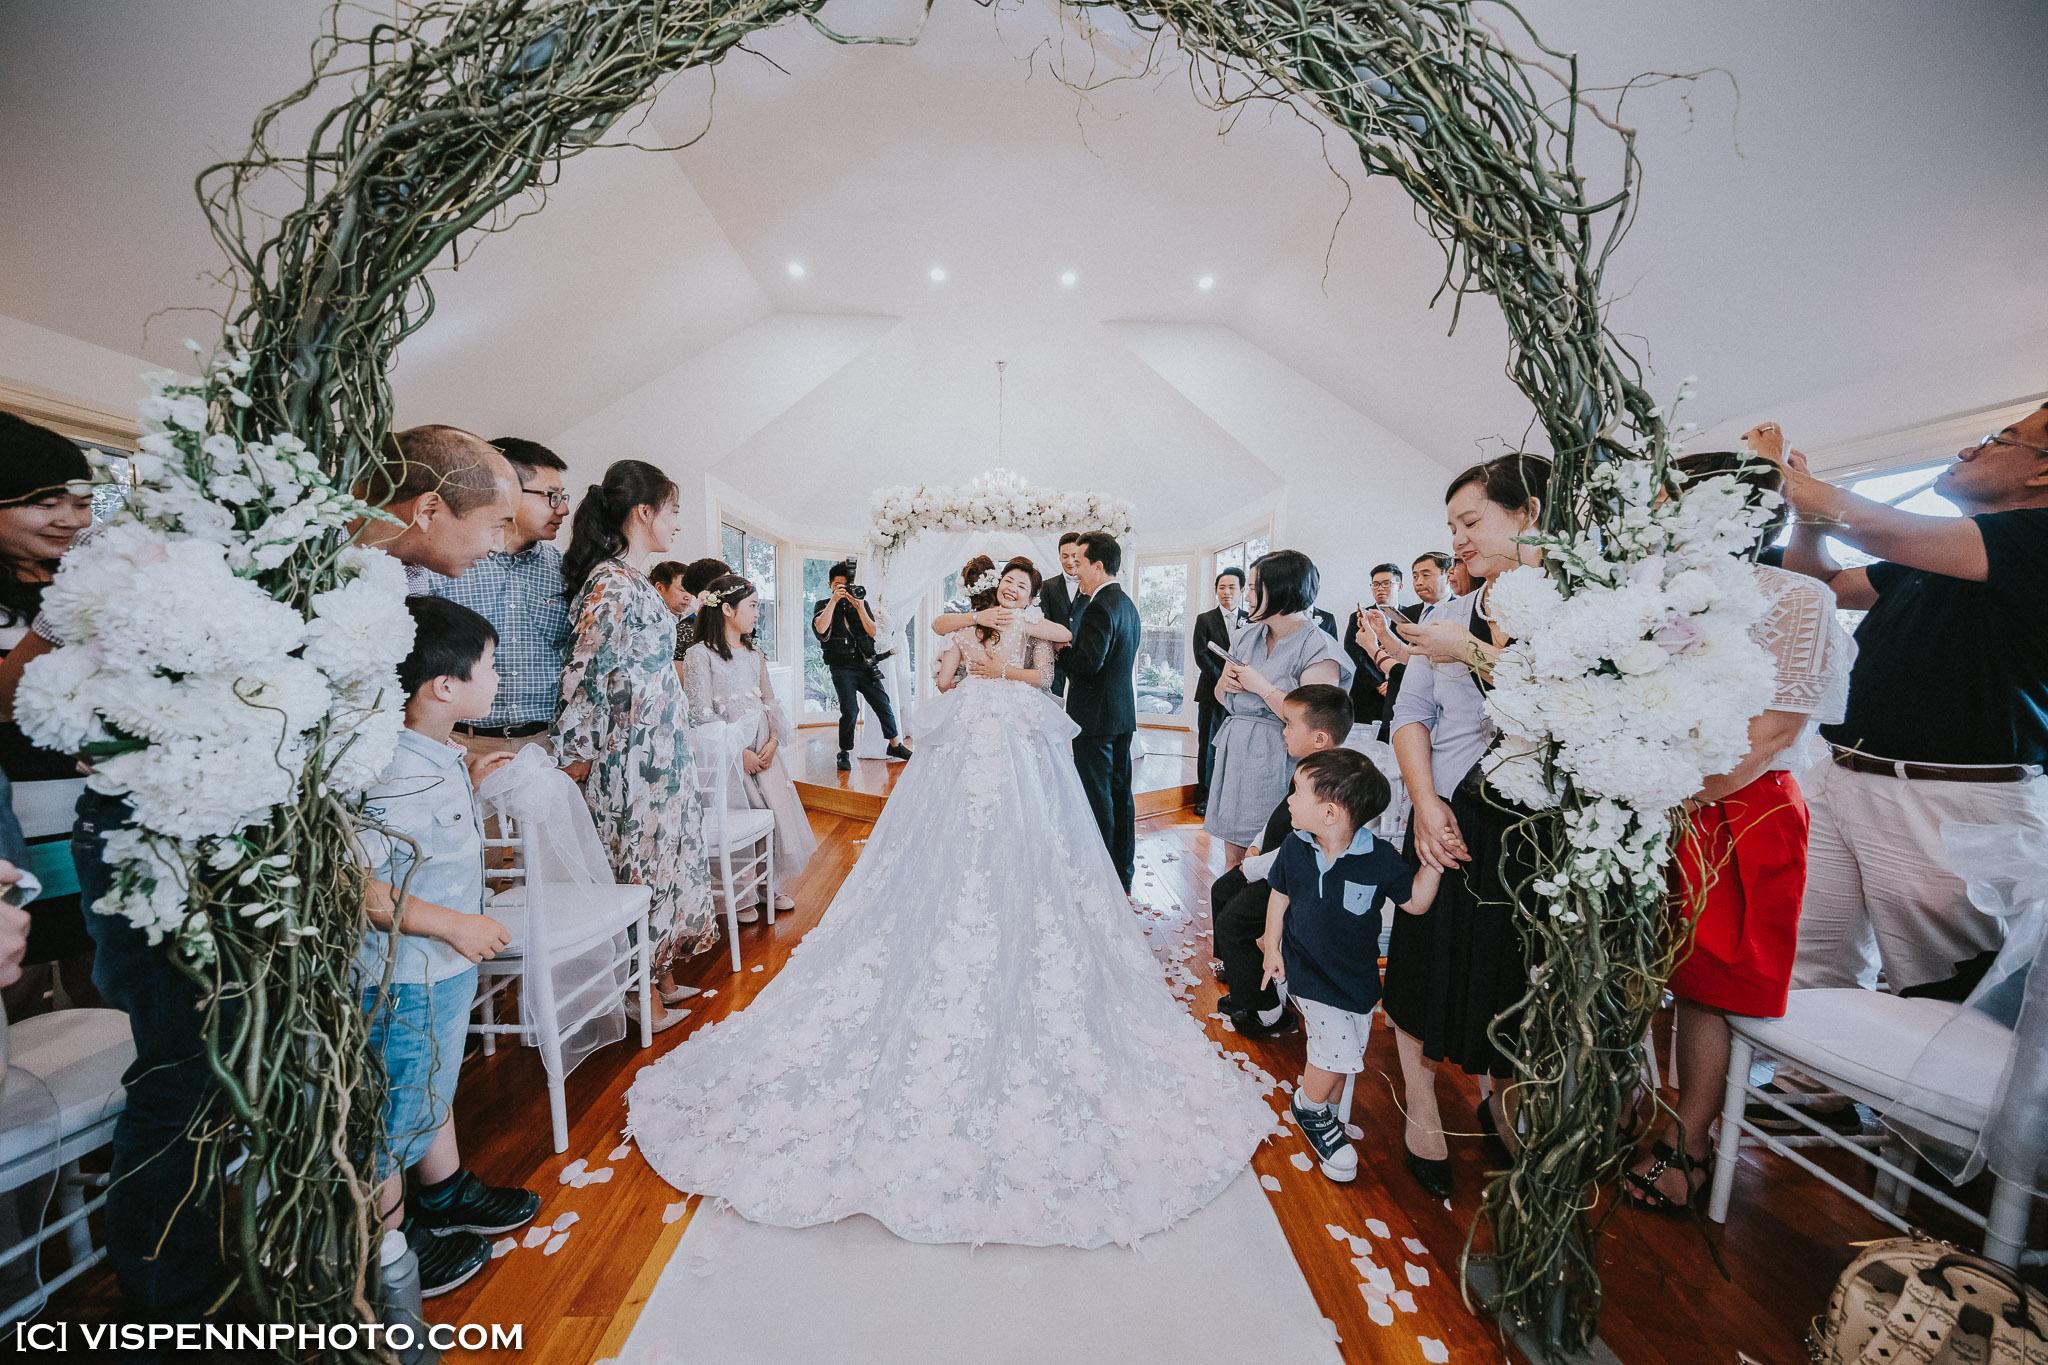 WEDDING DAY Photography Melbourne ZHPENN H4 0138